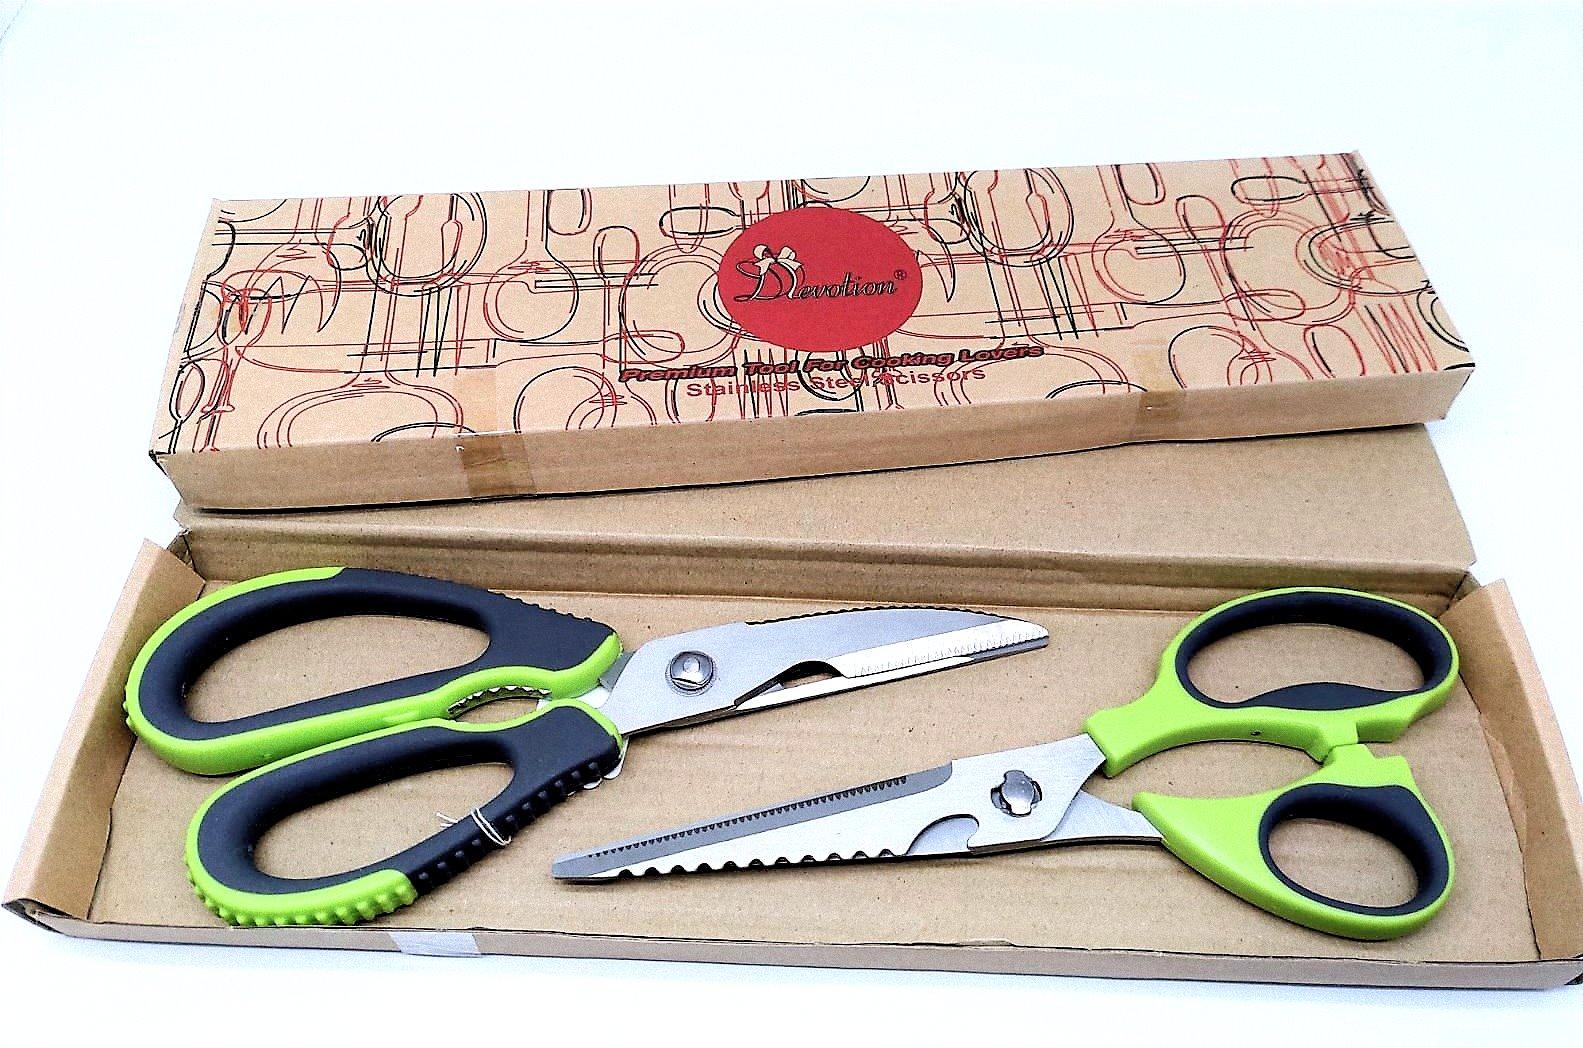 Devotion scissors set